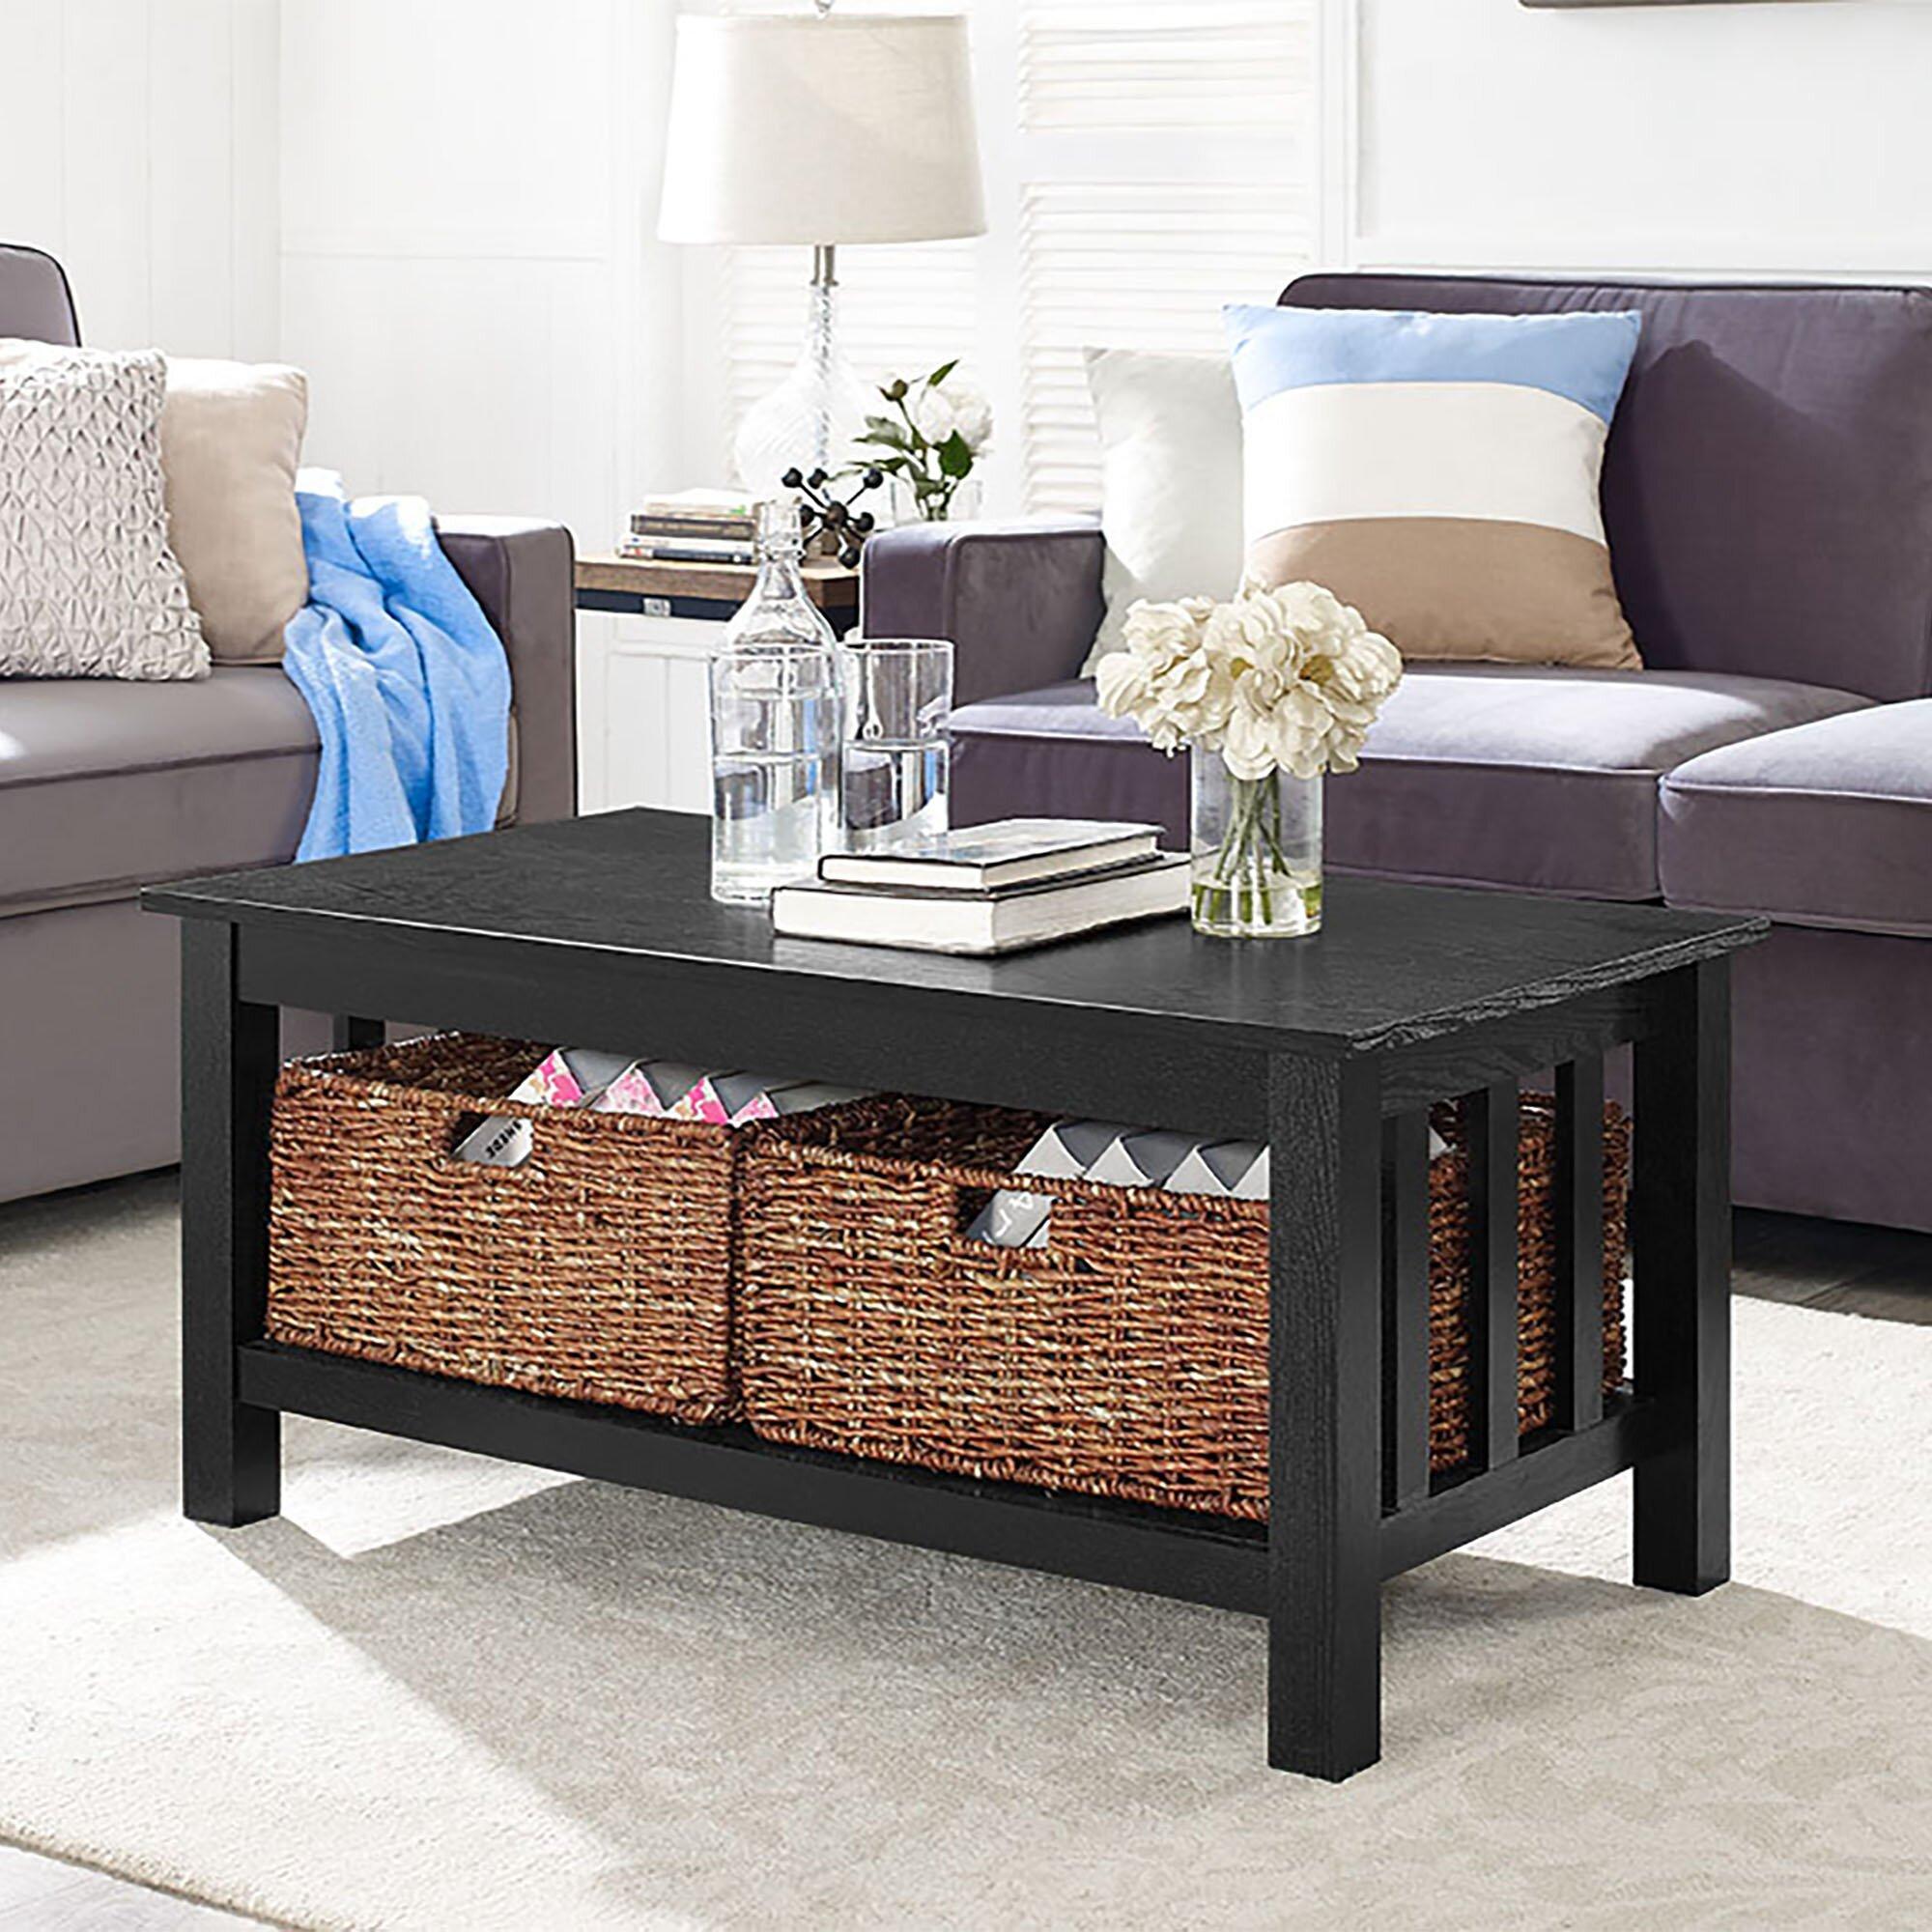 alcott hill stillman wood storage coffee table reviews wayfair. Black Bedroom Furniture Sets. Home Design Ideas